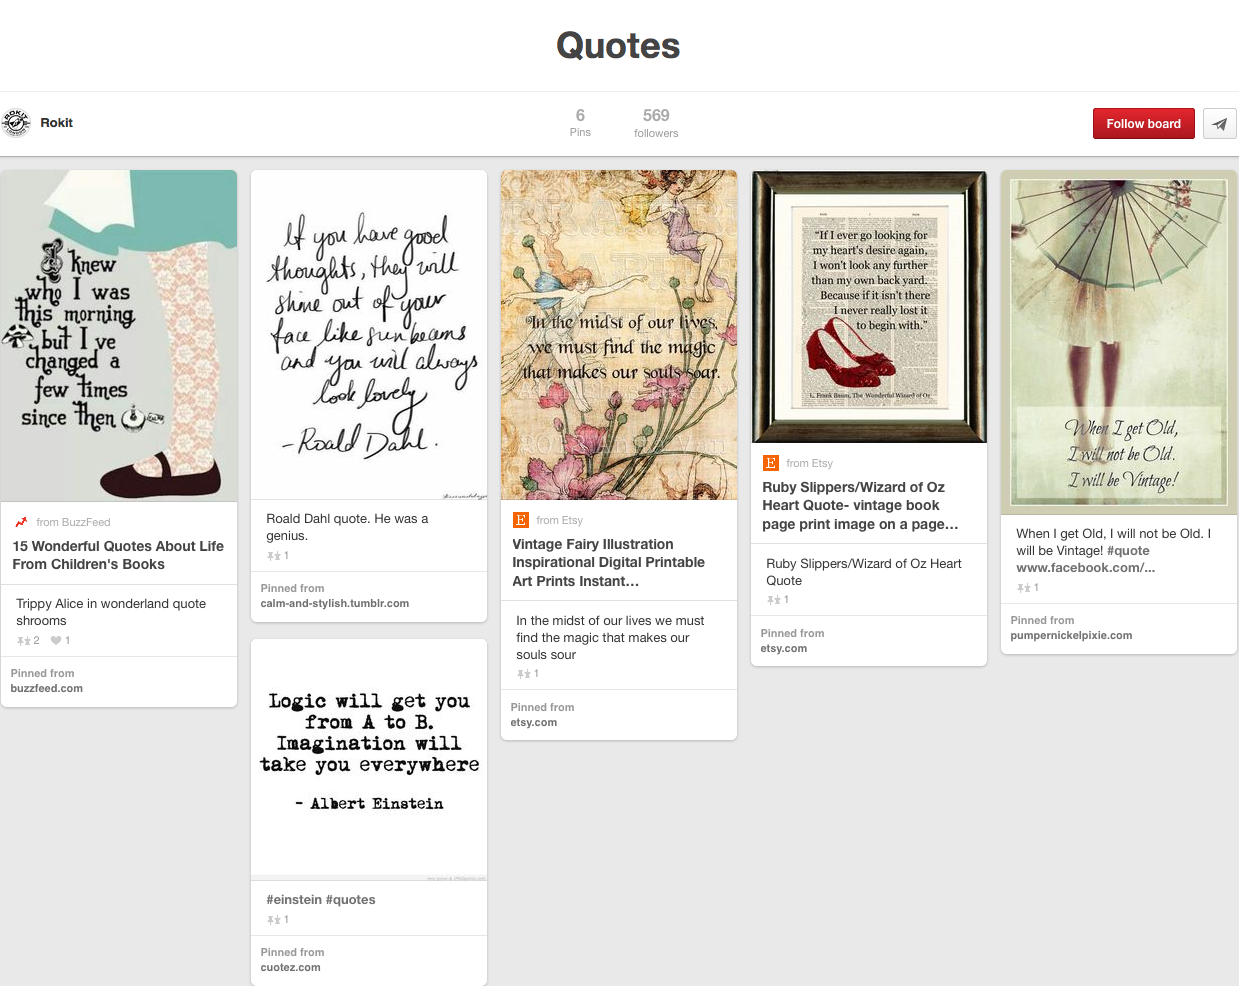 Rokit Pinterest page